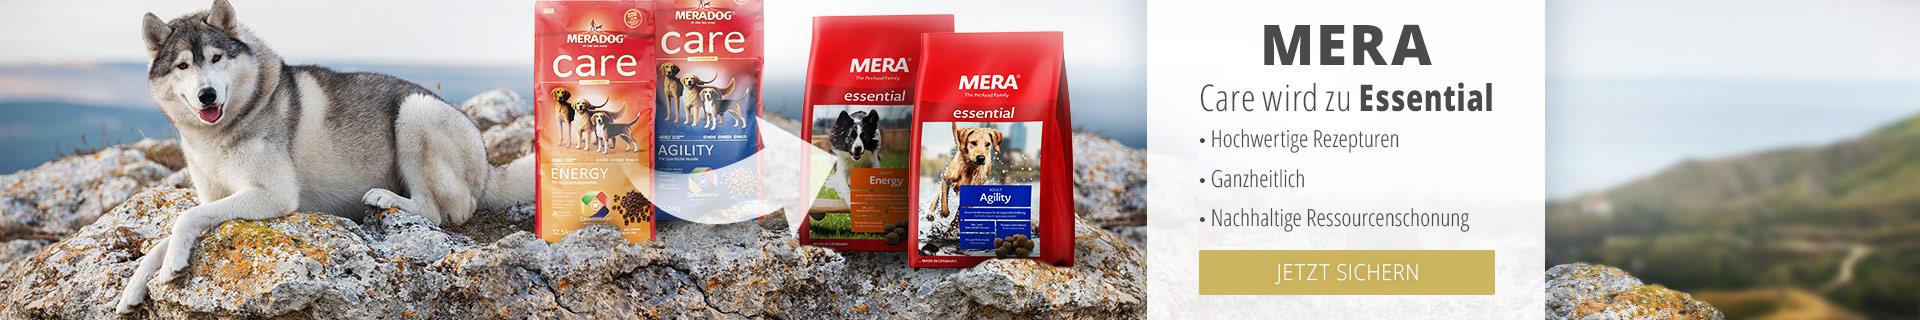 Mera Care wird Essential